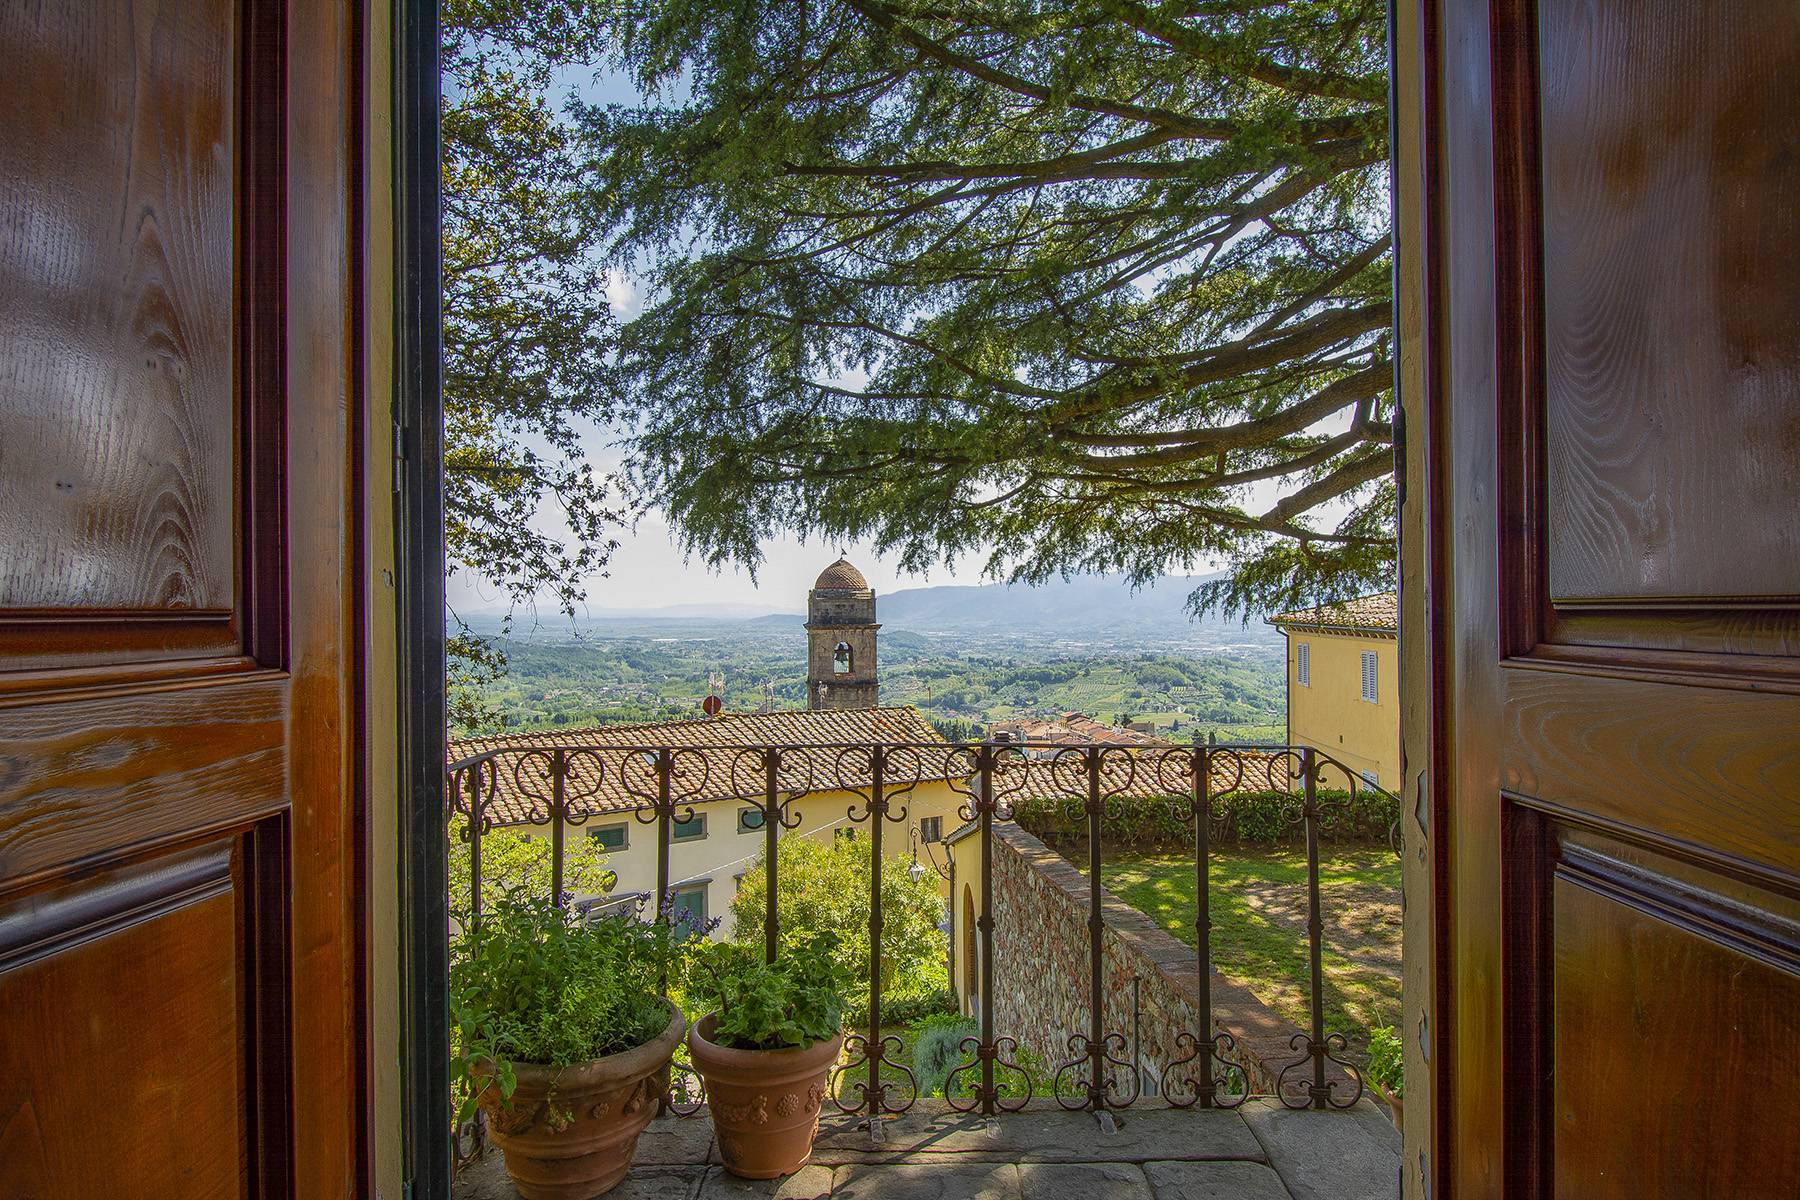 Villa in Vendita a Capannori: 5 locali, 380 mq - Foto 8